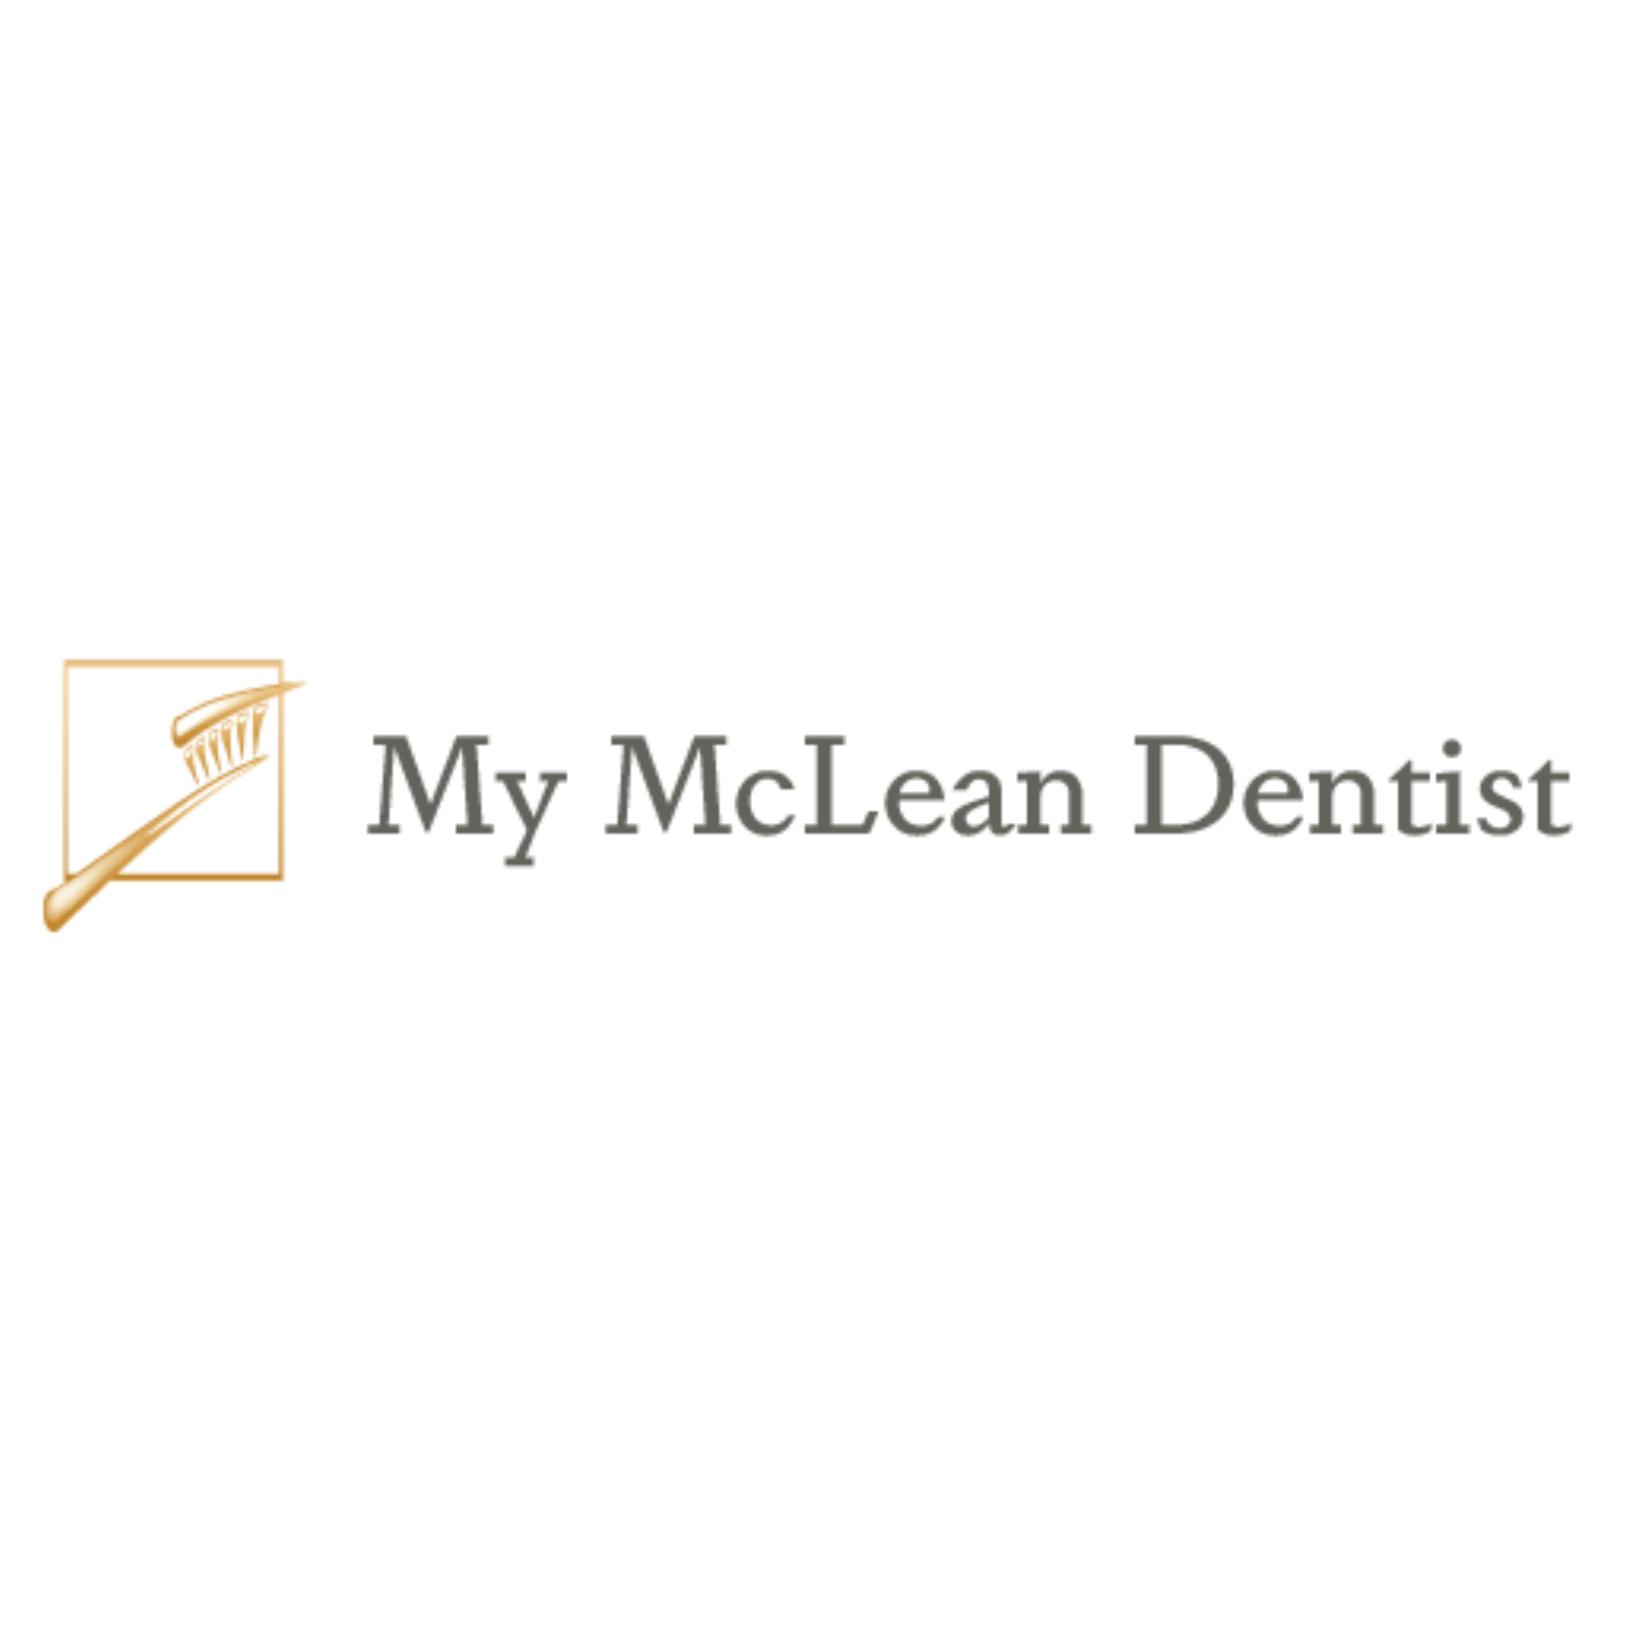 My McLean Dentist: Charlton Ho DDS & Alexander Sadak, DDS